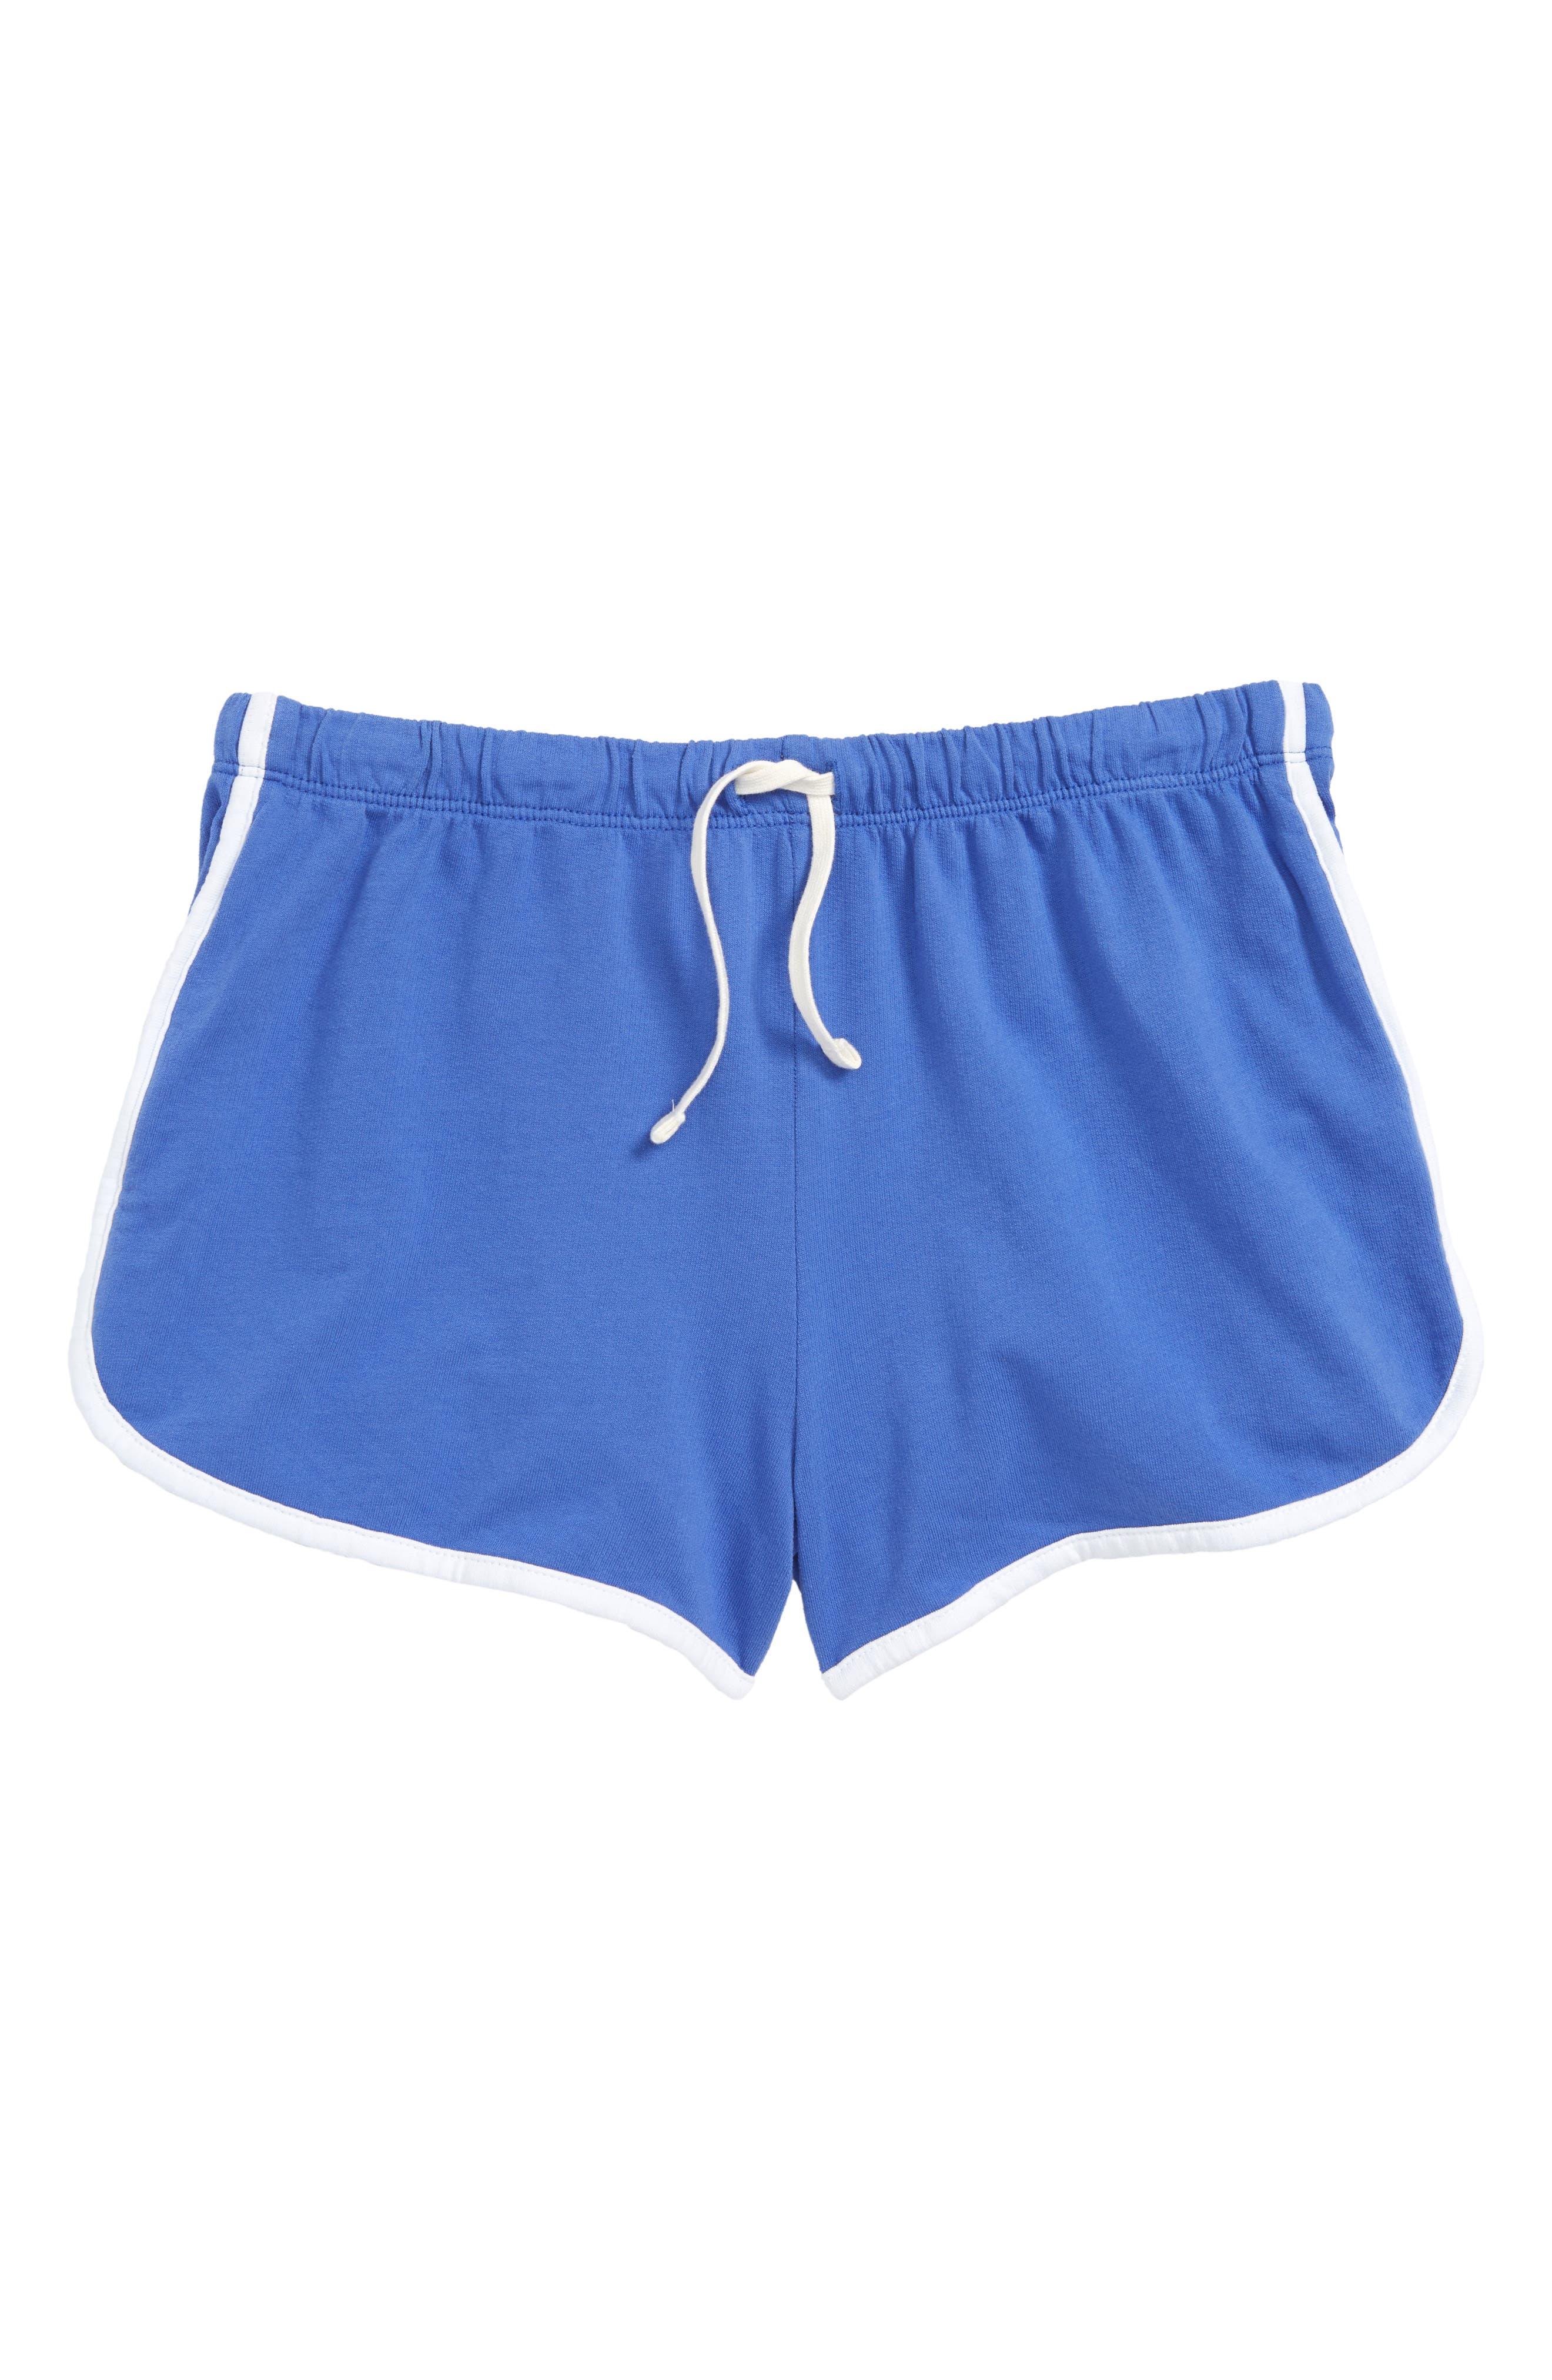 Cotton Dolphin Shorts,                             Main thumbnail 4, color,